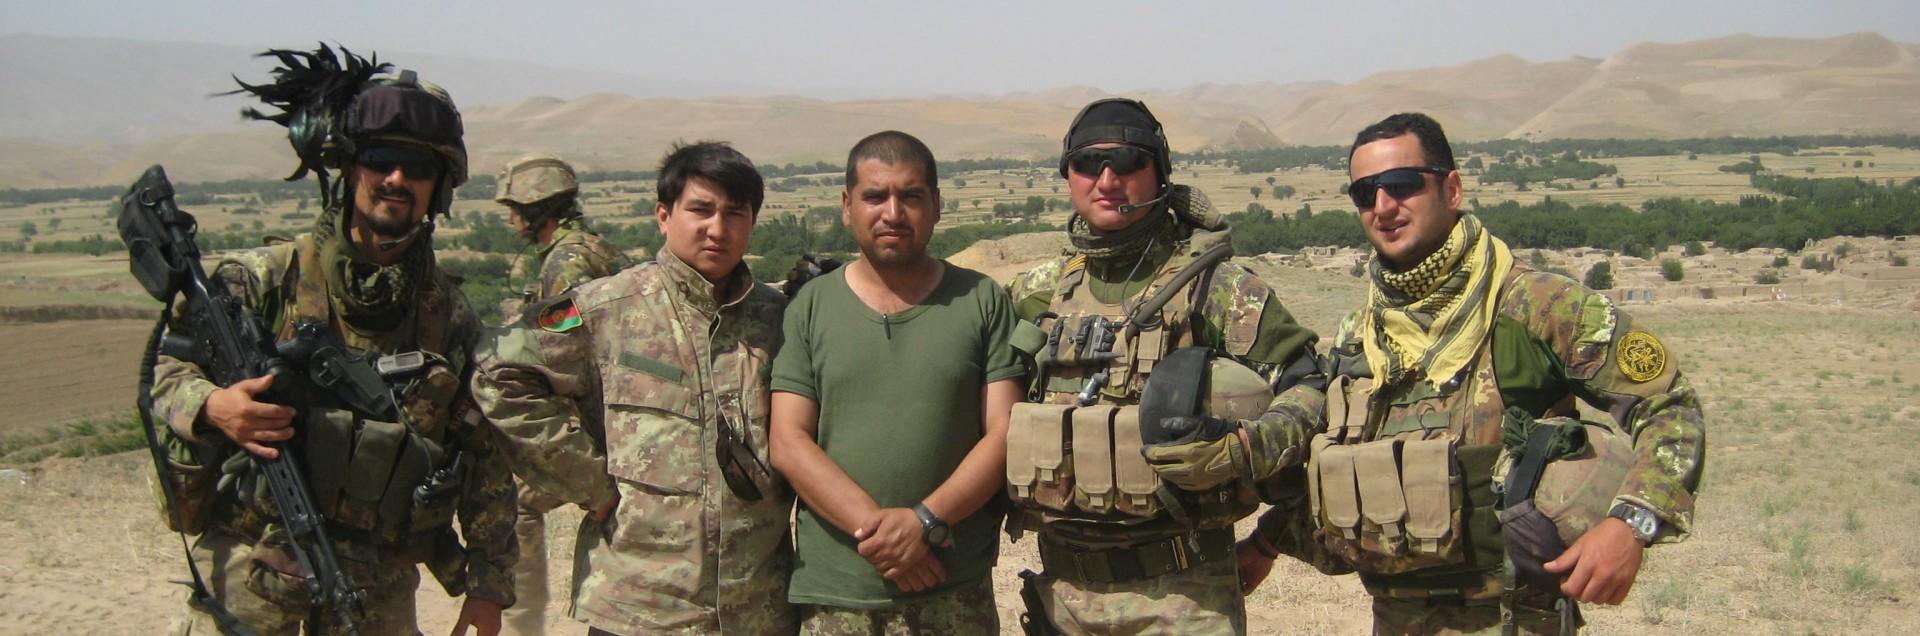 Dall'Afghanistan all'Italia per sfuggire dai talebani